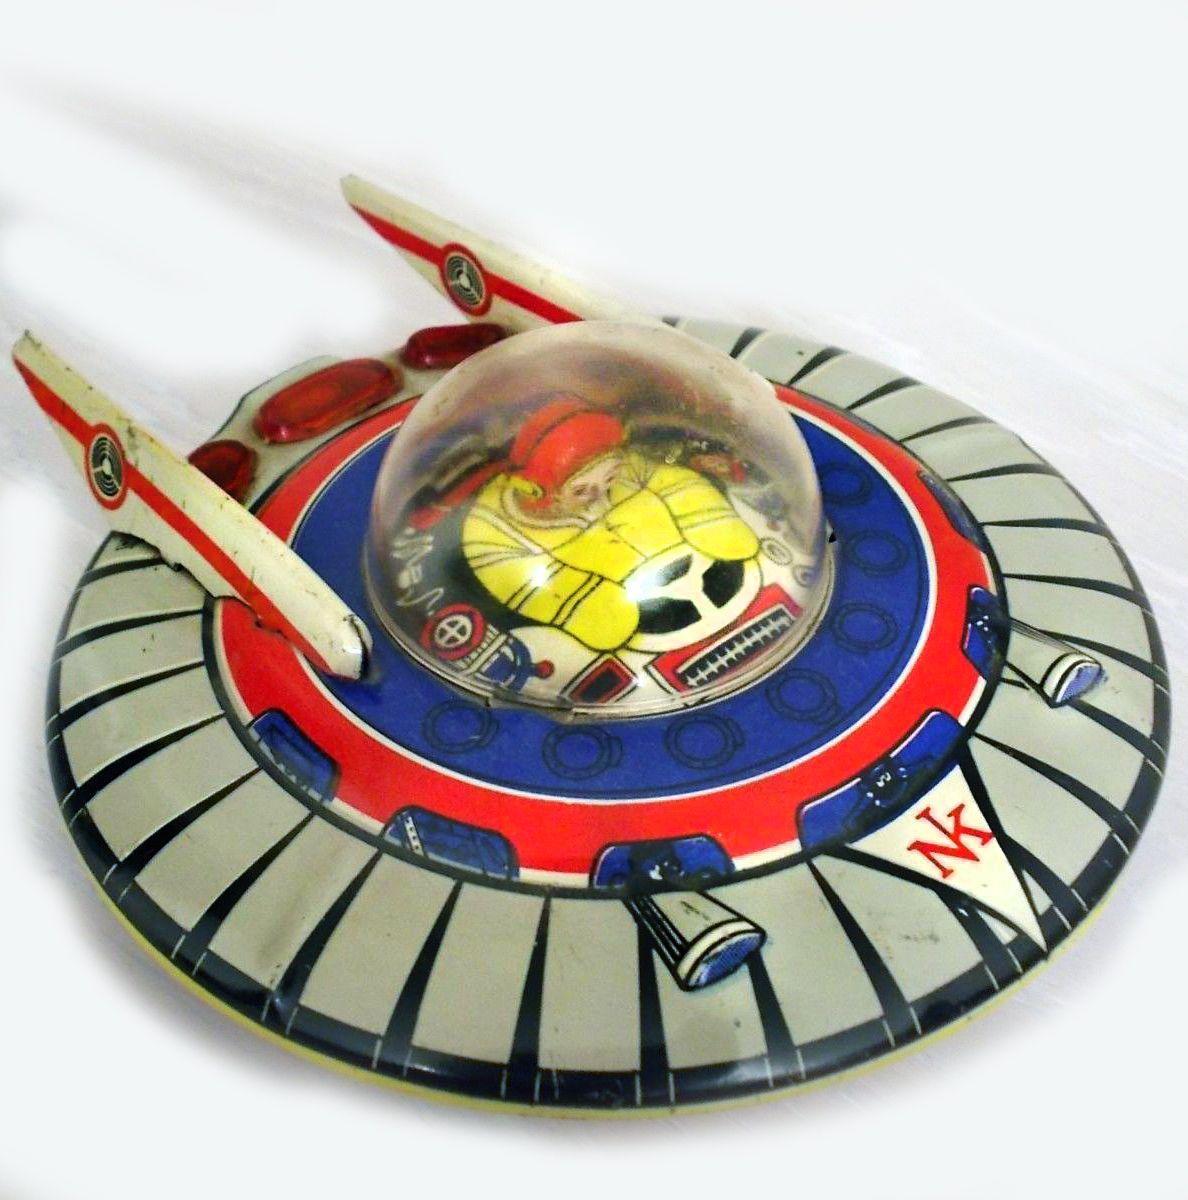 Vintage Turkish made Tin Flying Saucer Toy. More primitive